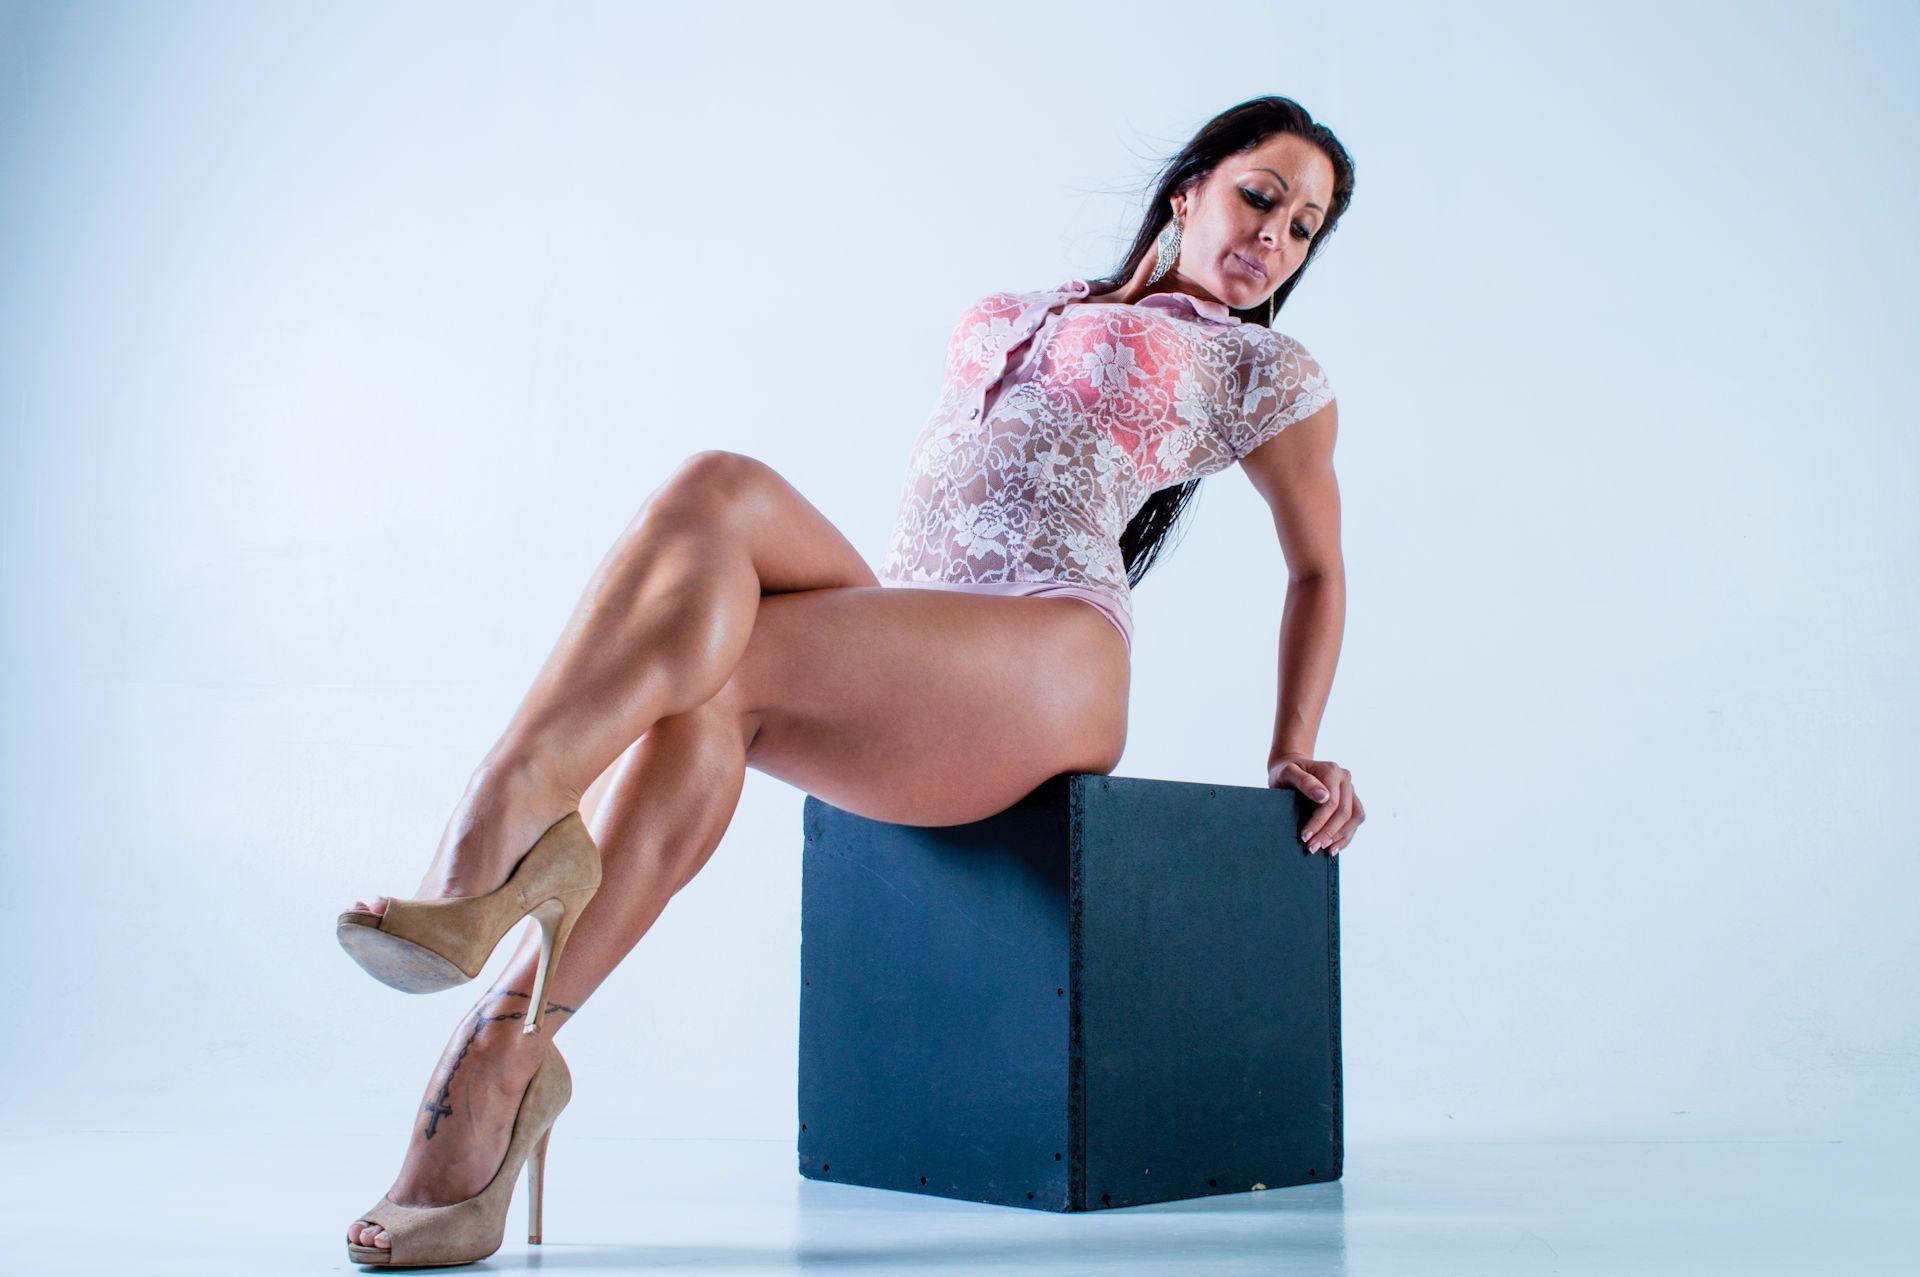 Kinky Women Pics